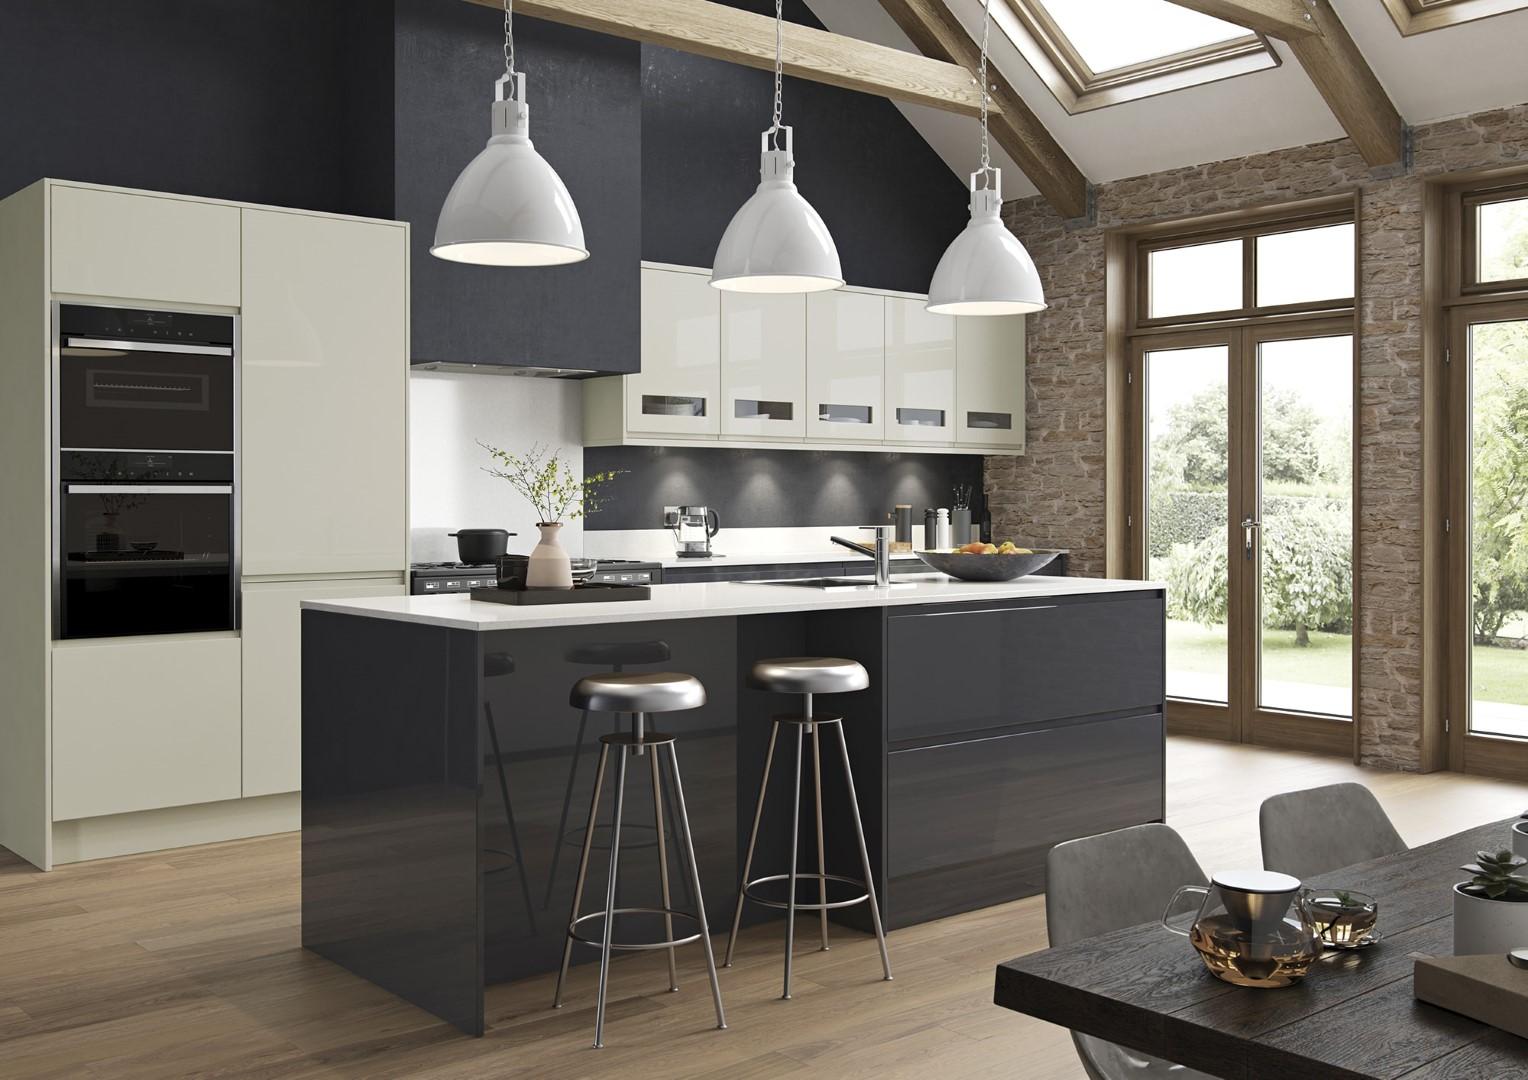 Modern Contemporary Kitchen - Strada Gloss Porcelain, Graphite Kitchen - Kitchen Design - Alan Kelly Kitchens - Waterford